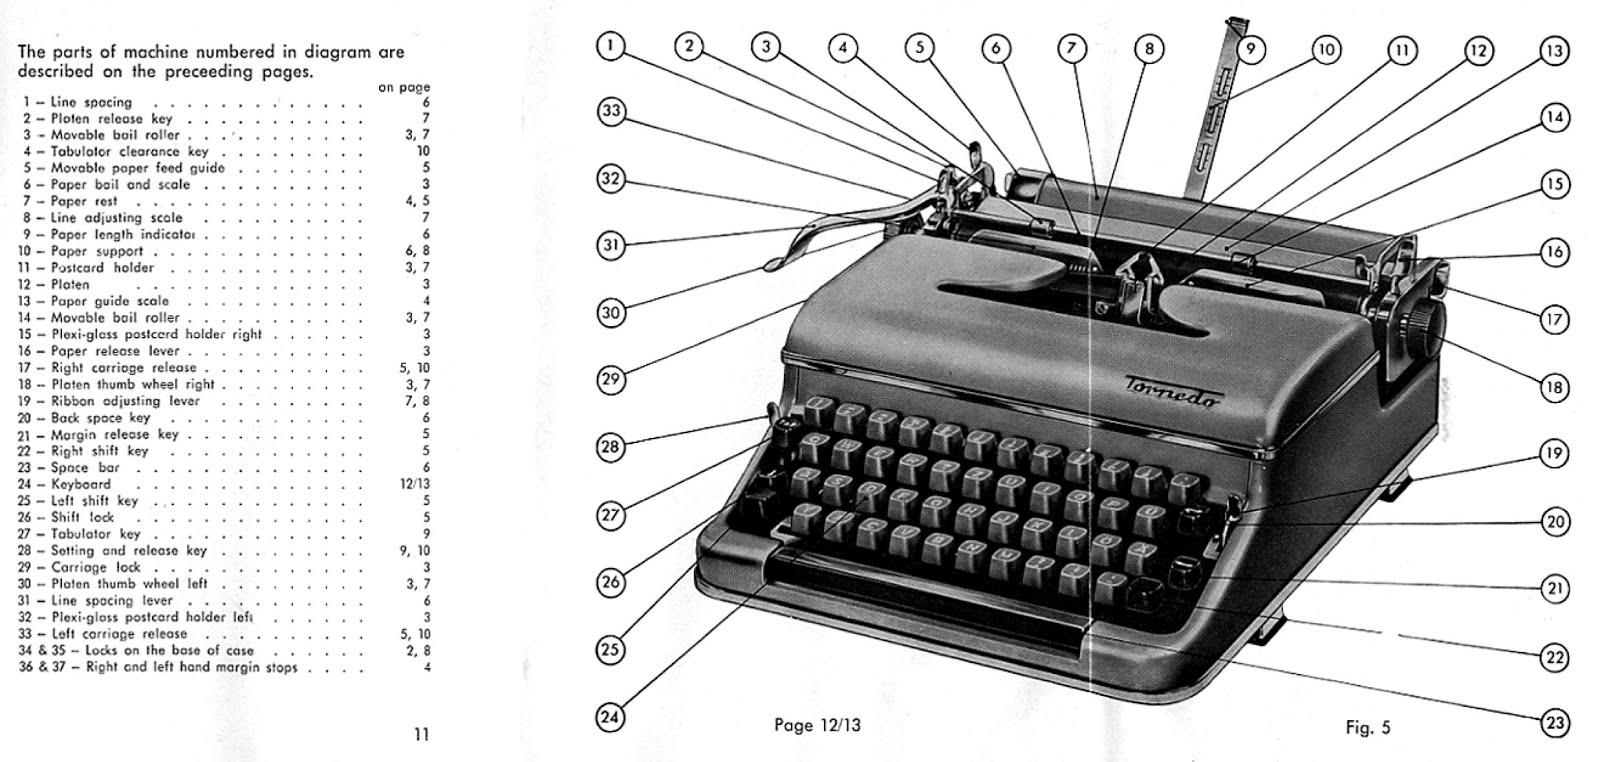 The Typewriter Revolution blog: 1960 Torpedo 18b